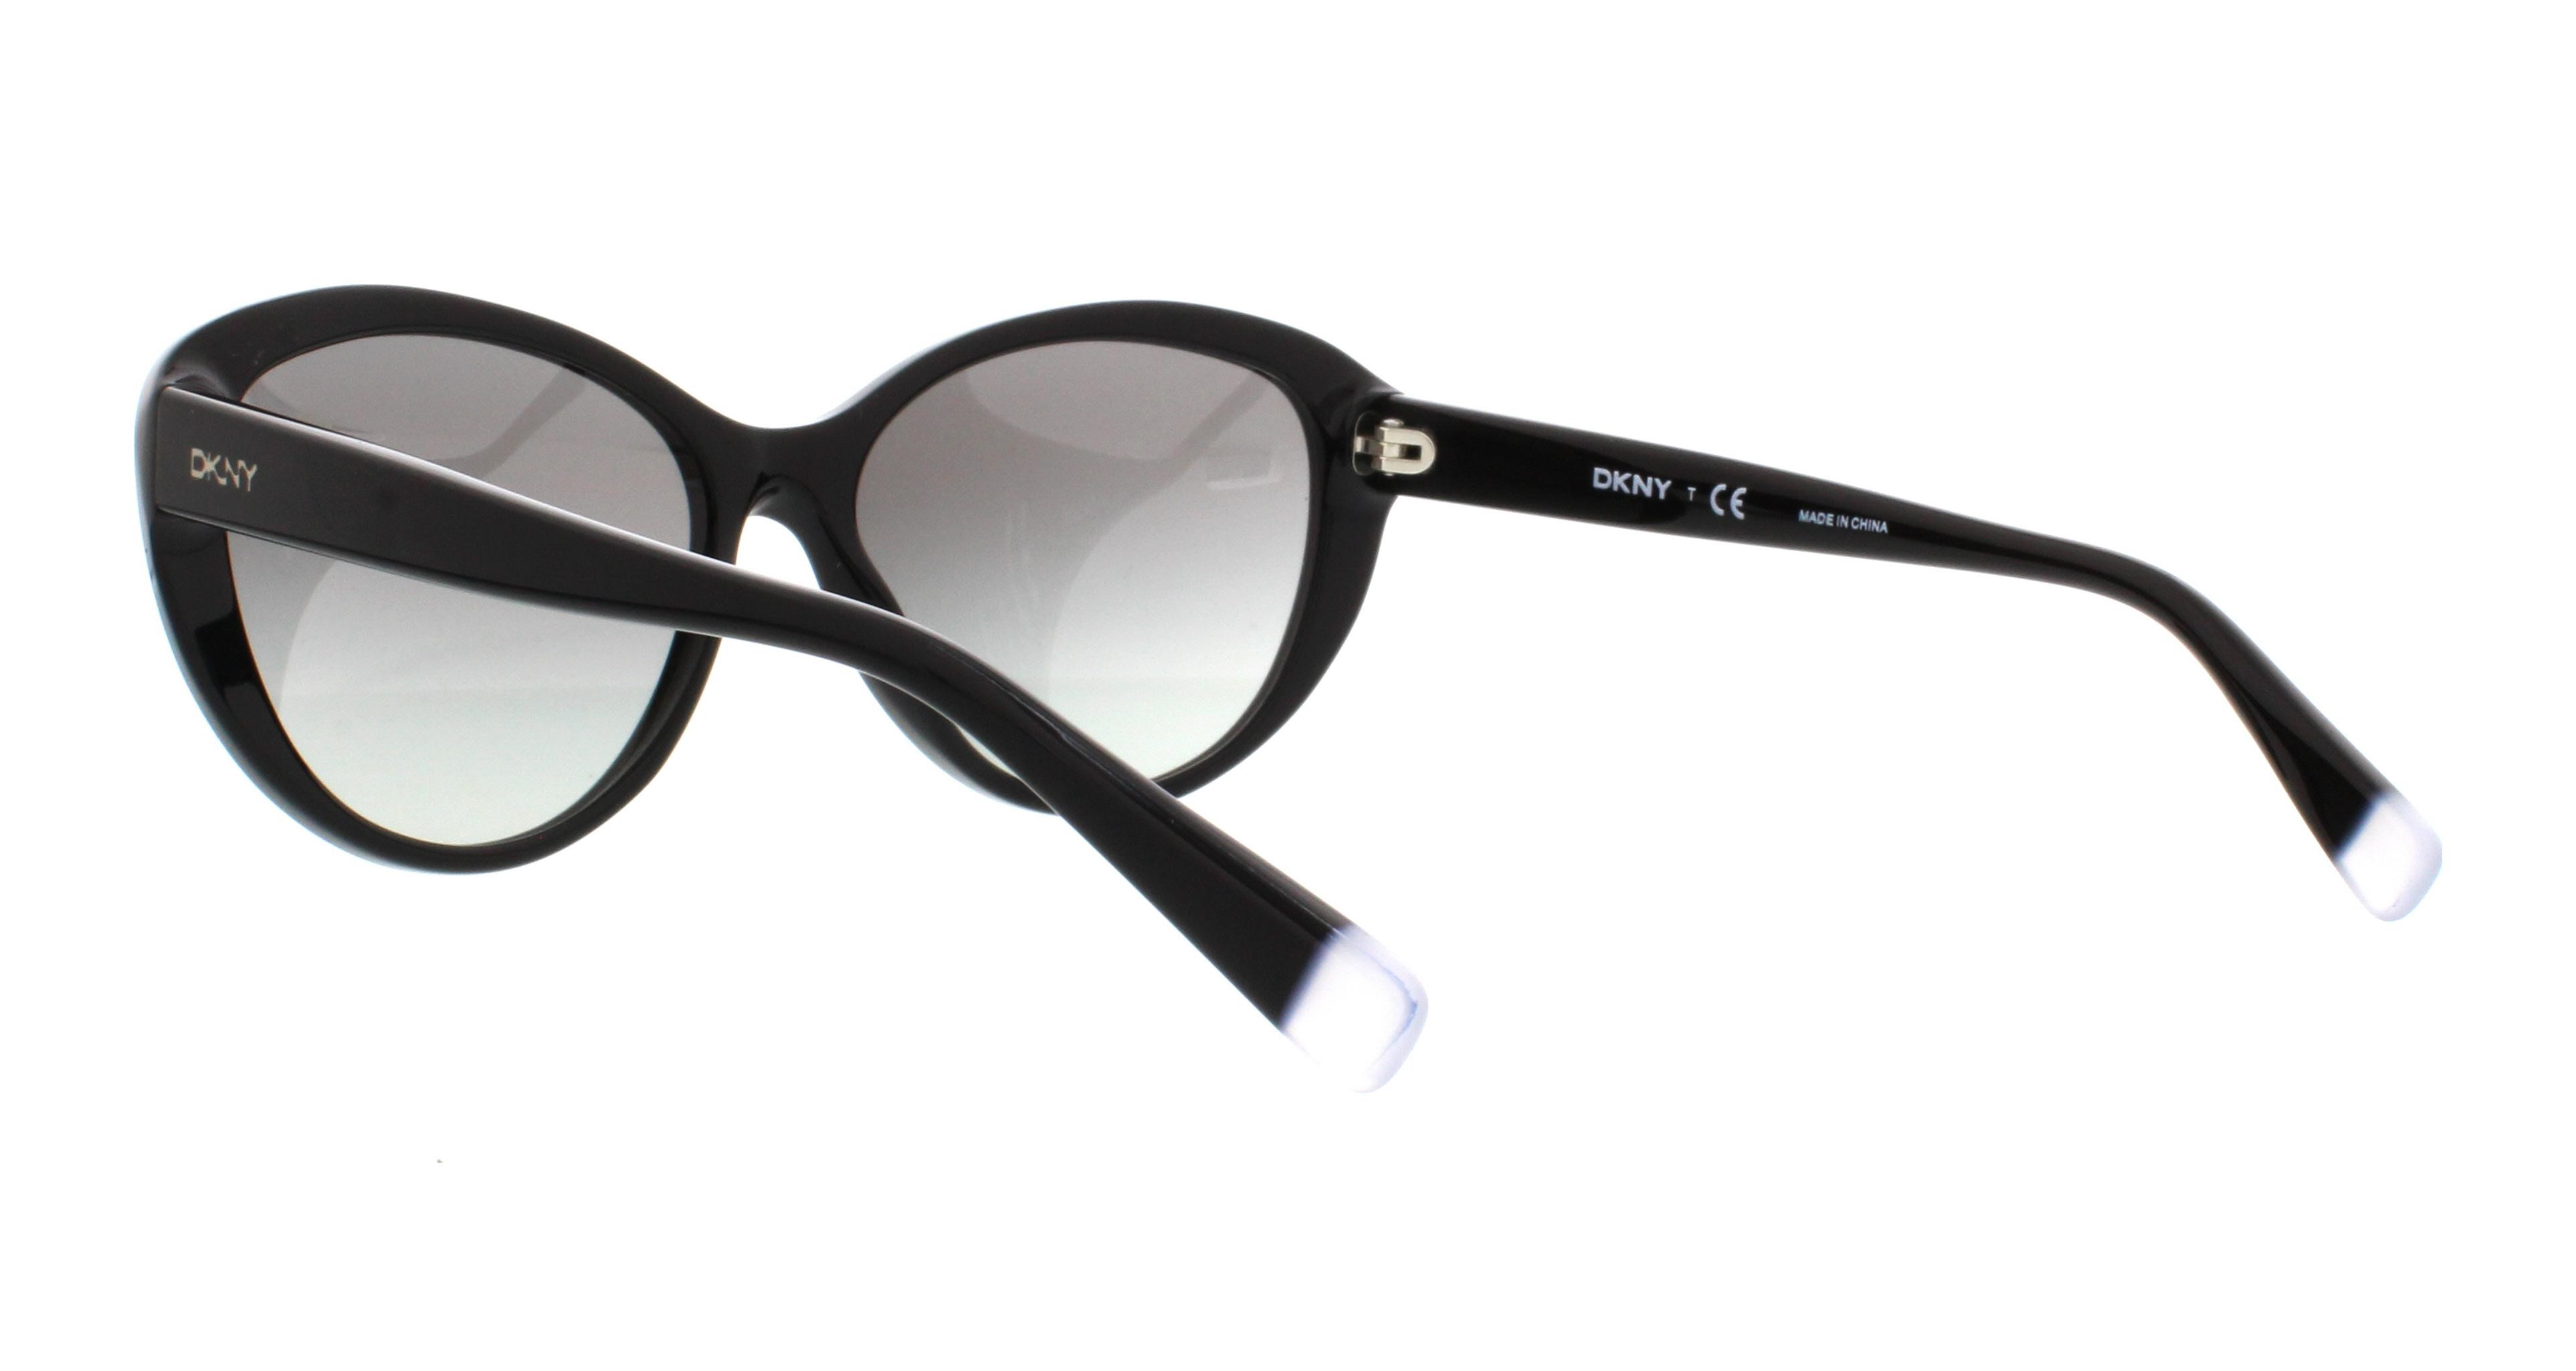 DKNY DY4084 Sonnenbrille Tortoise 301613 57mm fEhPsguhui